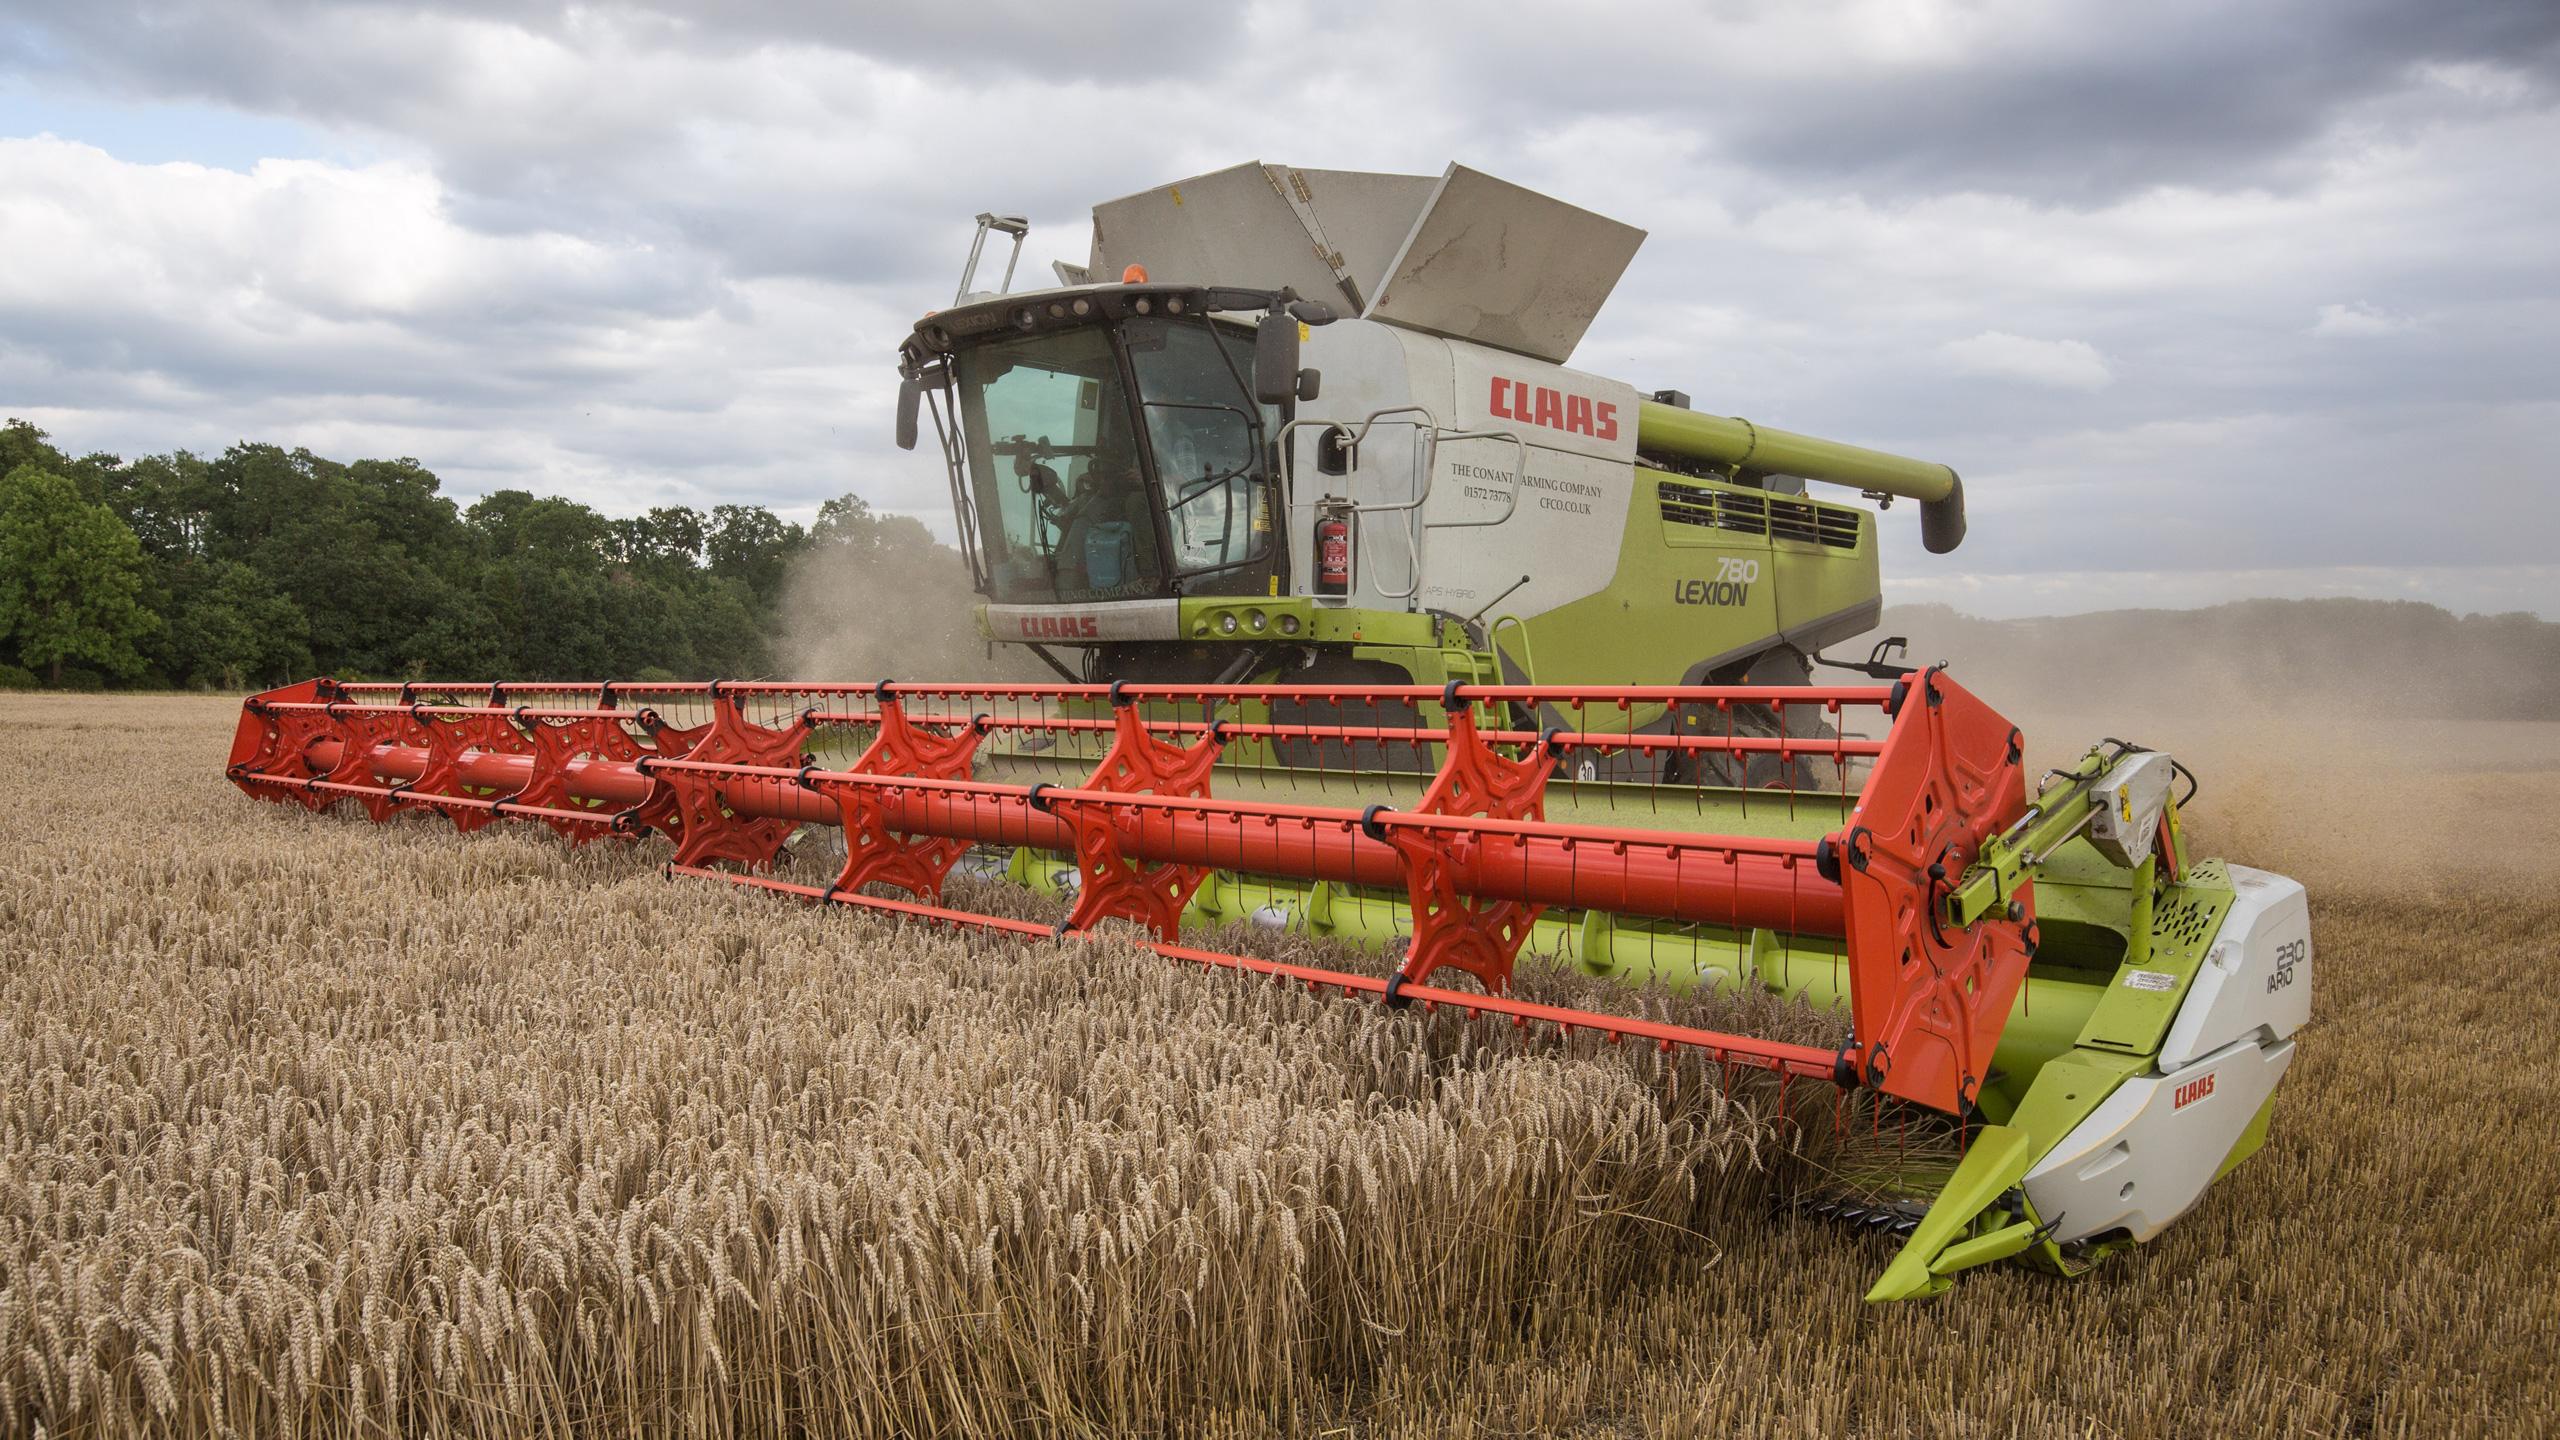 Claas Lexion 780 Combine Harvesting Wheat